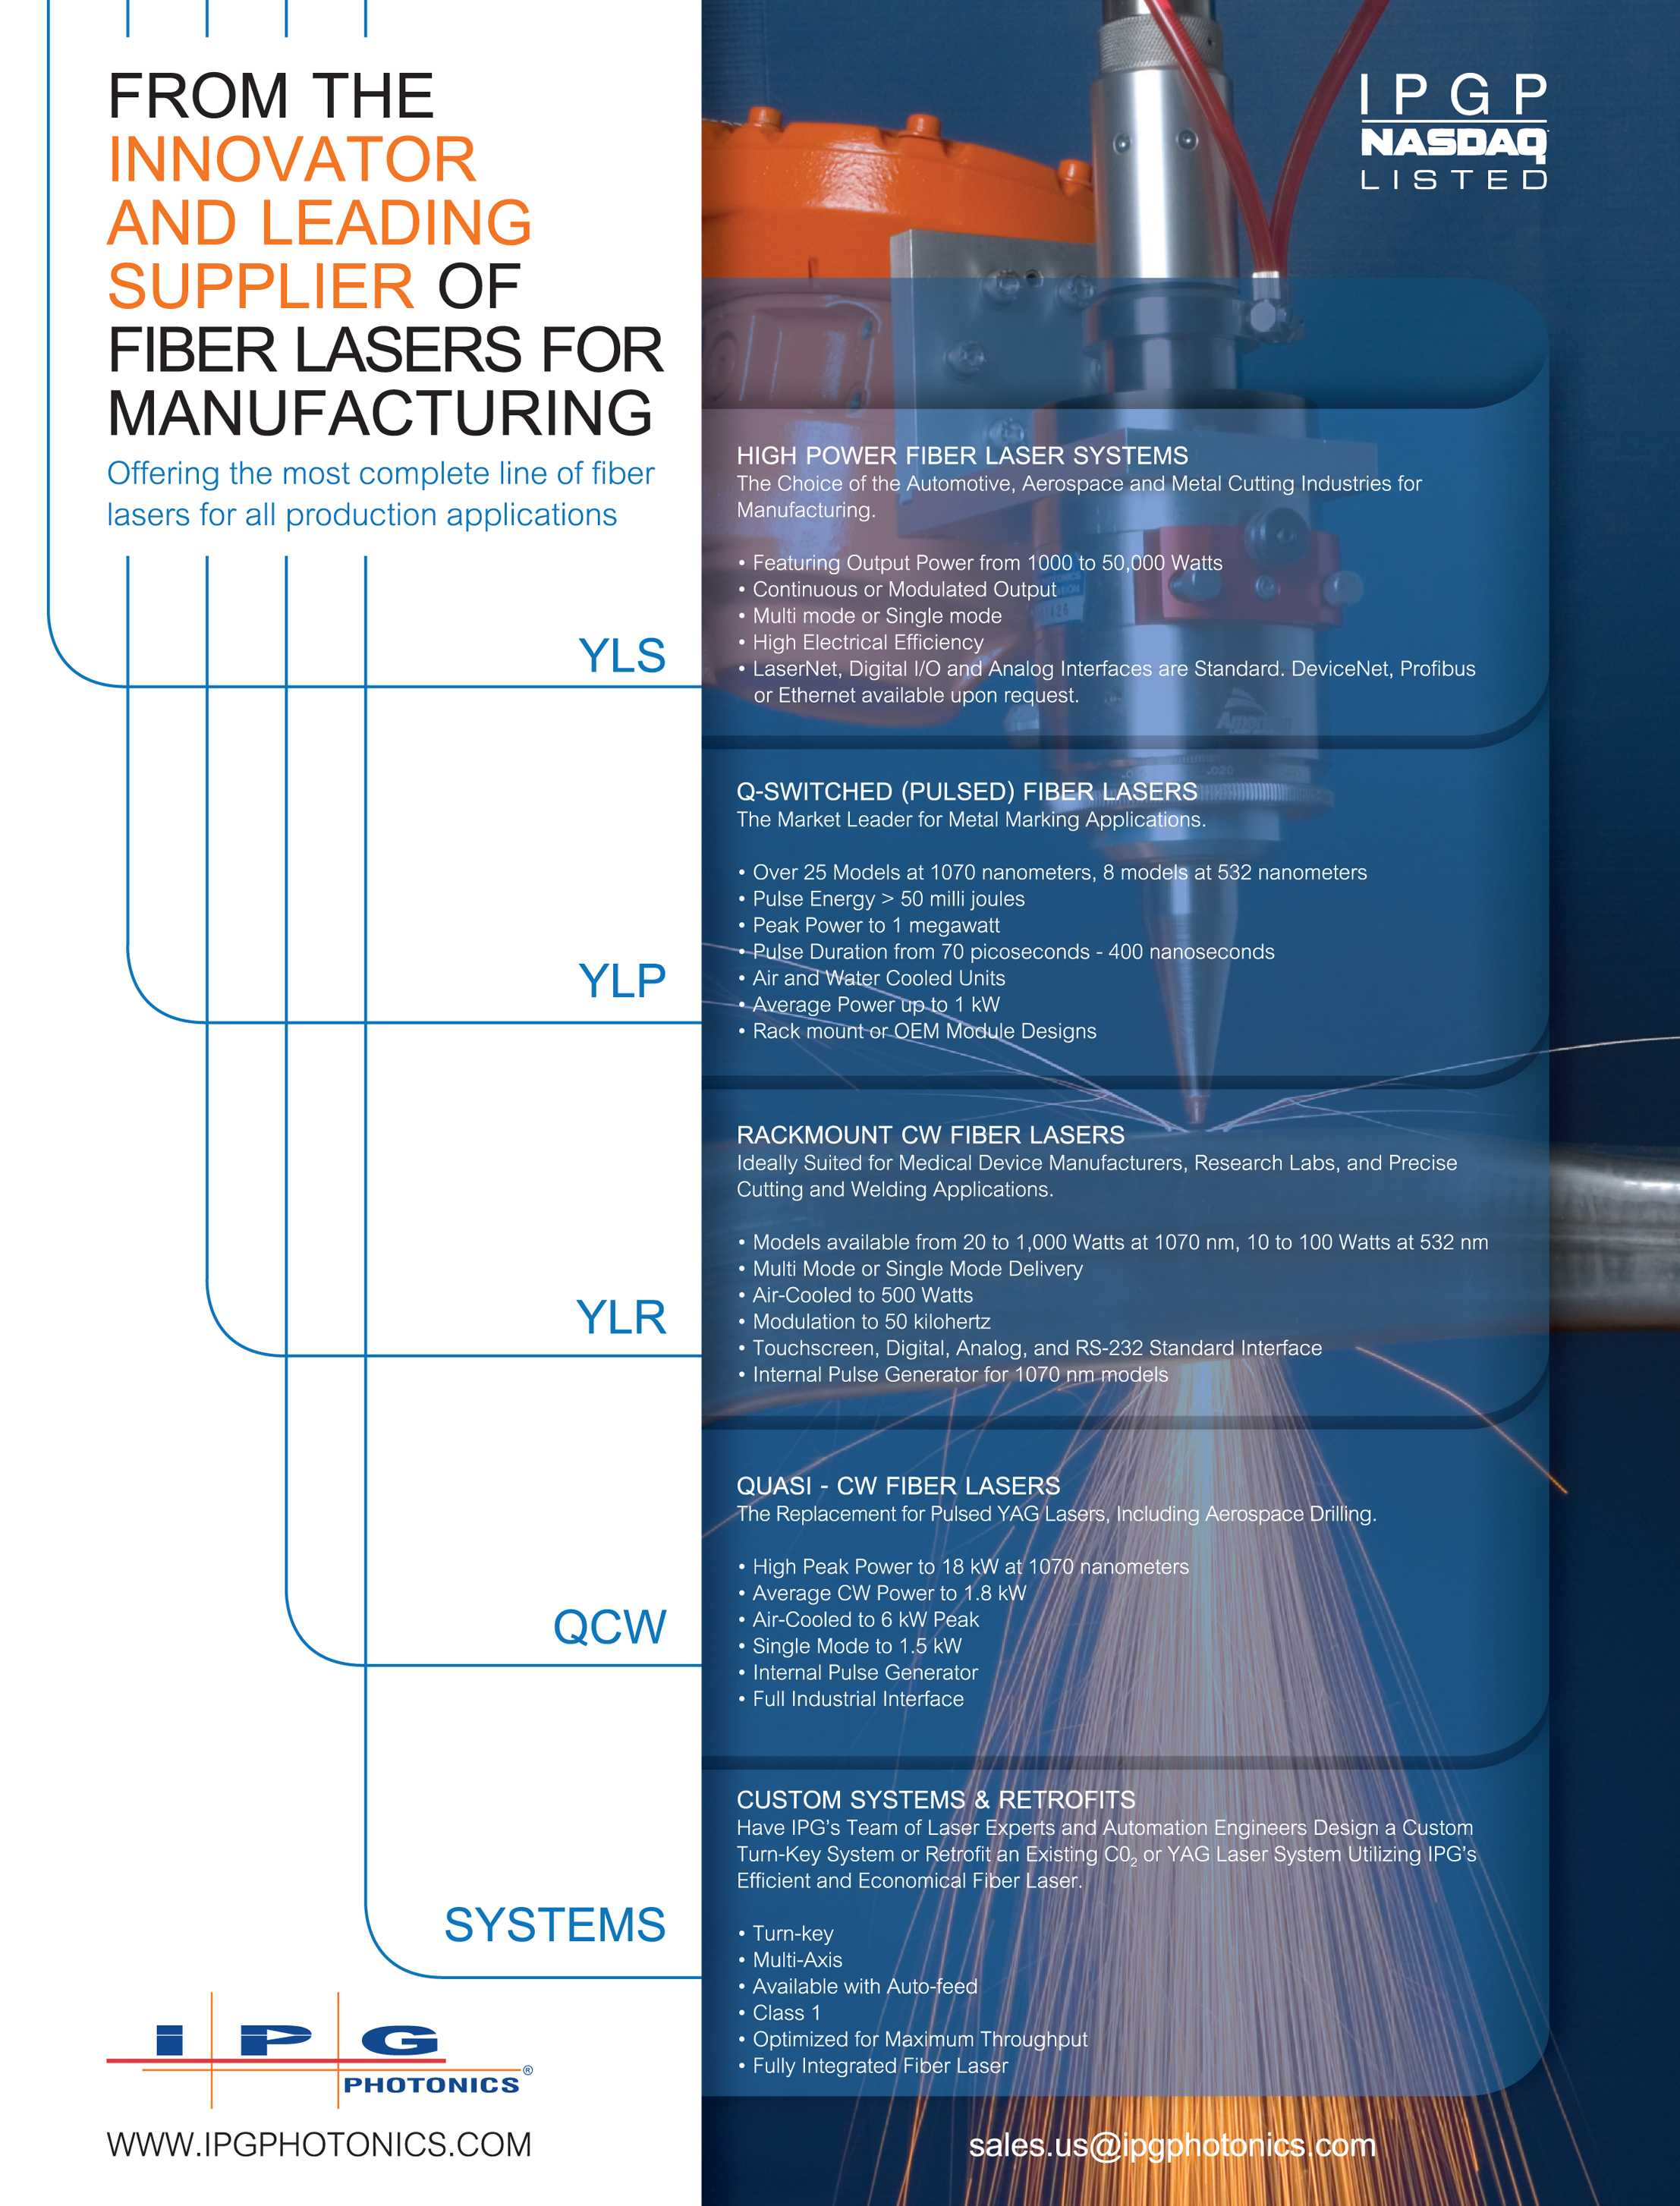 Industrial Laser Solutions - September/October 2013 - page C2